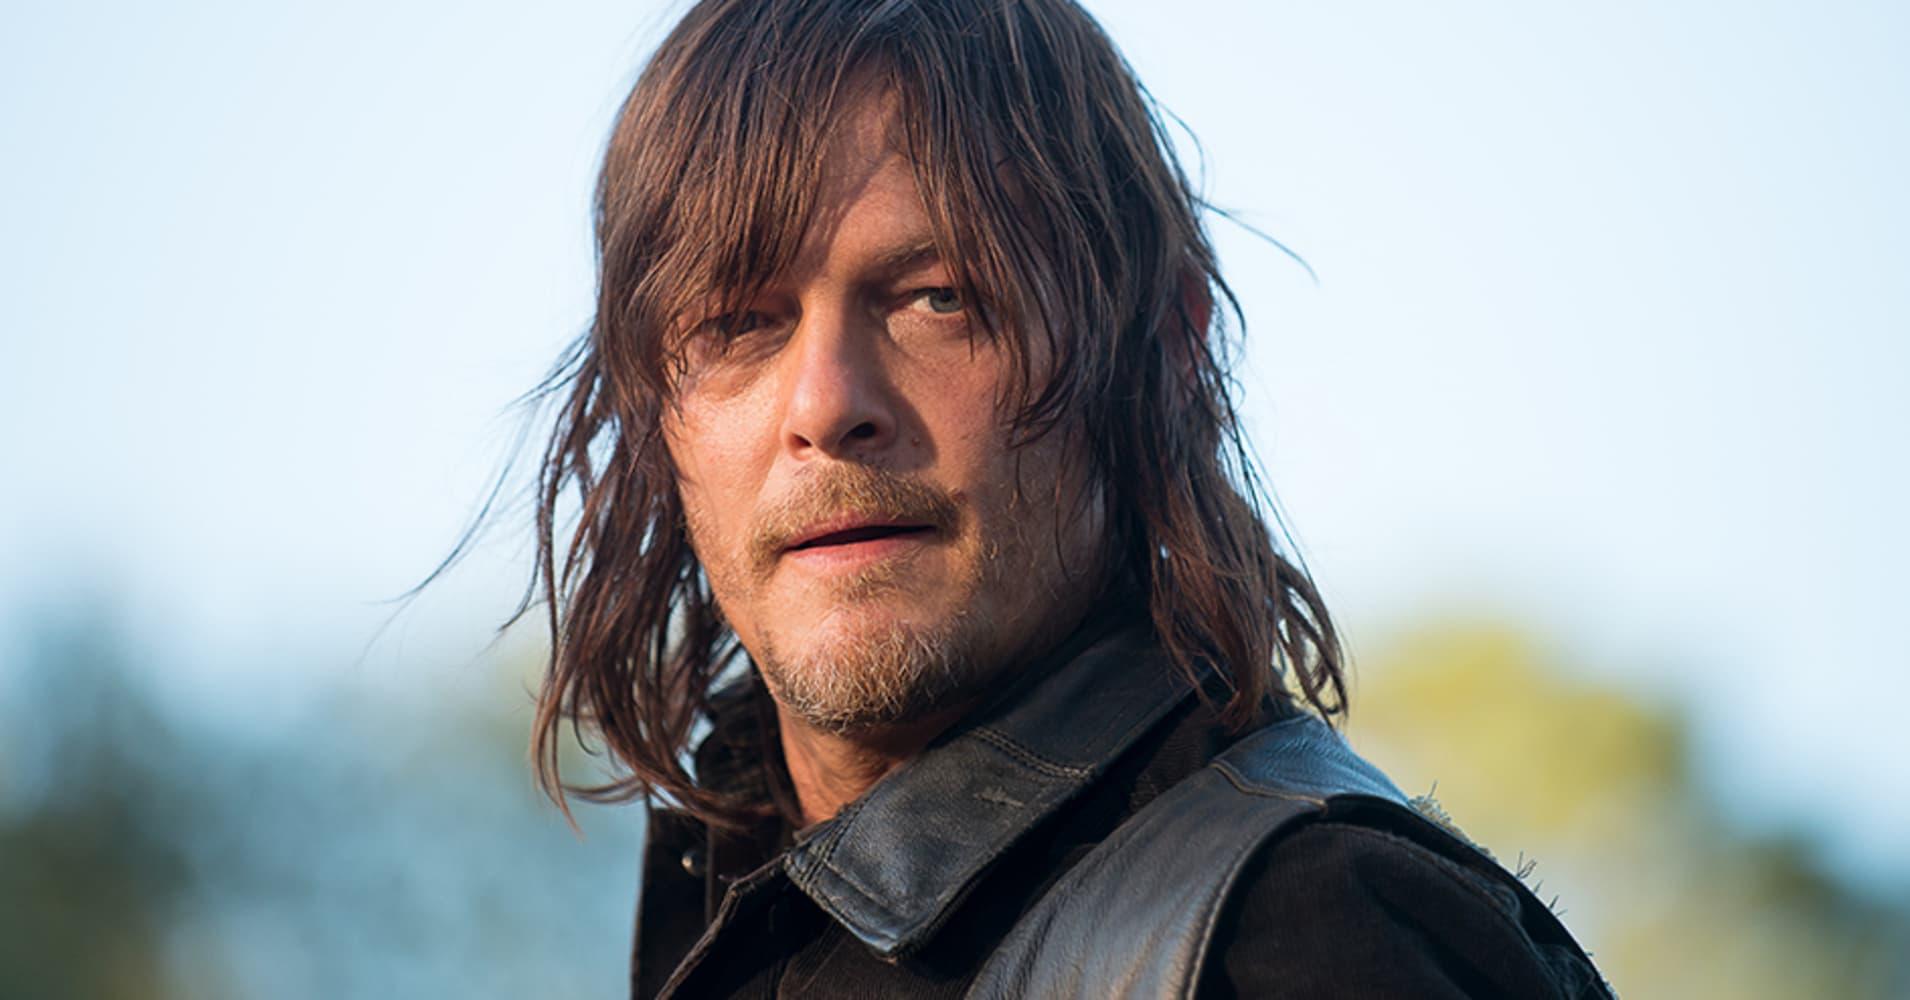 The Walking Dead' acto...